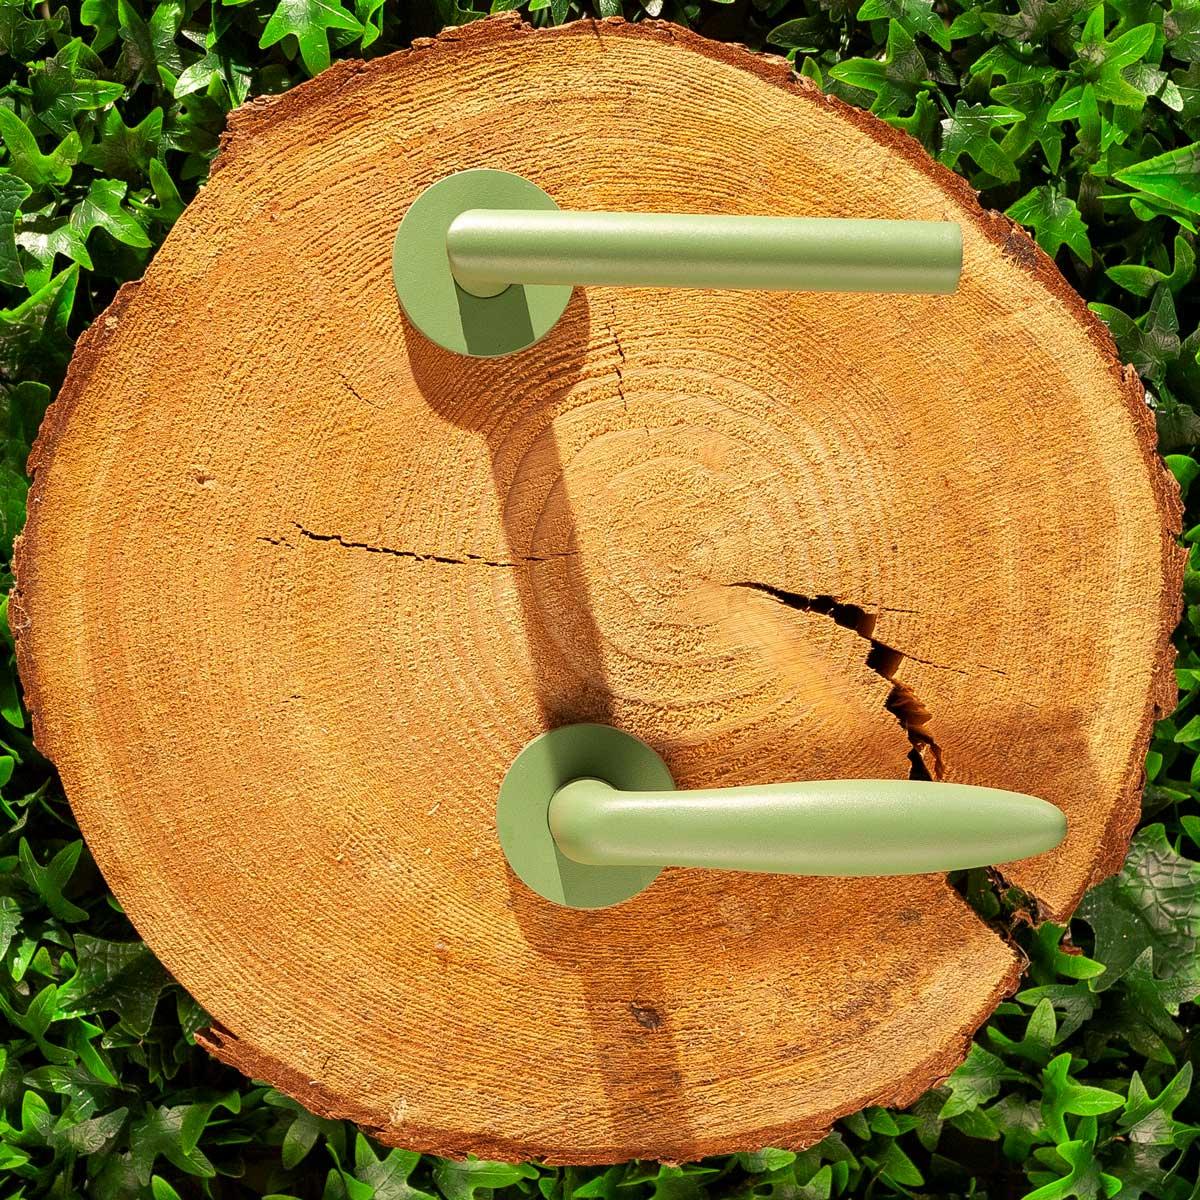 Sfeerimpressie urban jungle leaf gpf135 gpf115.jpg